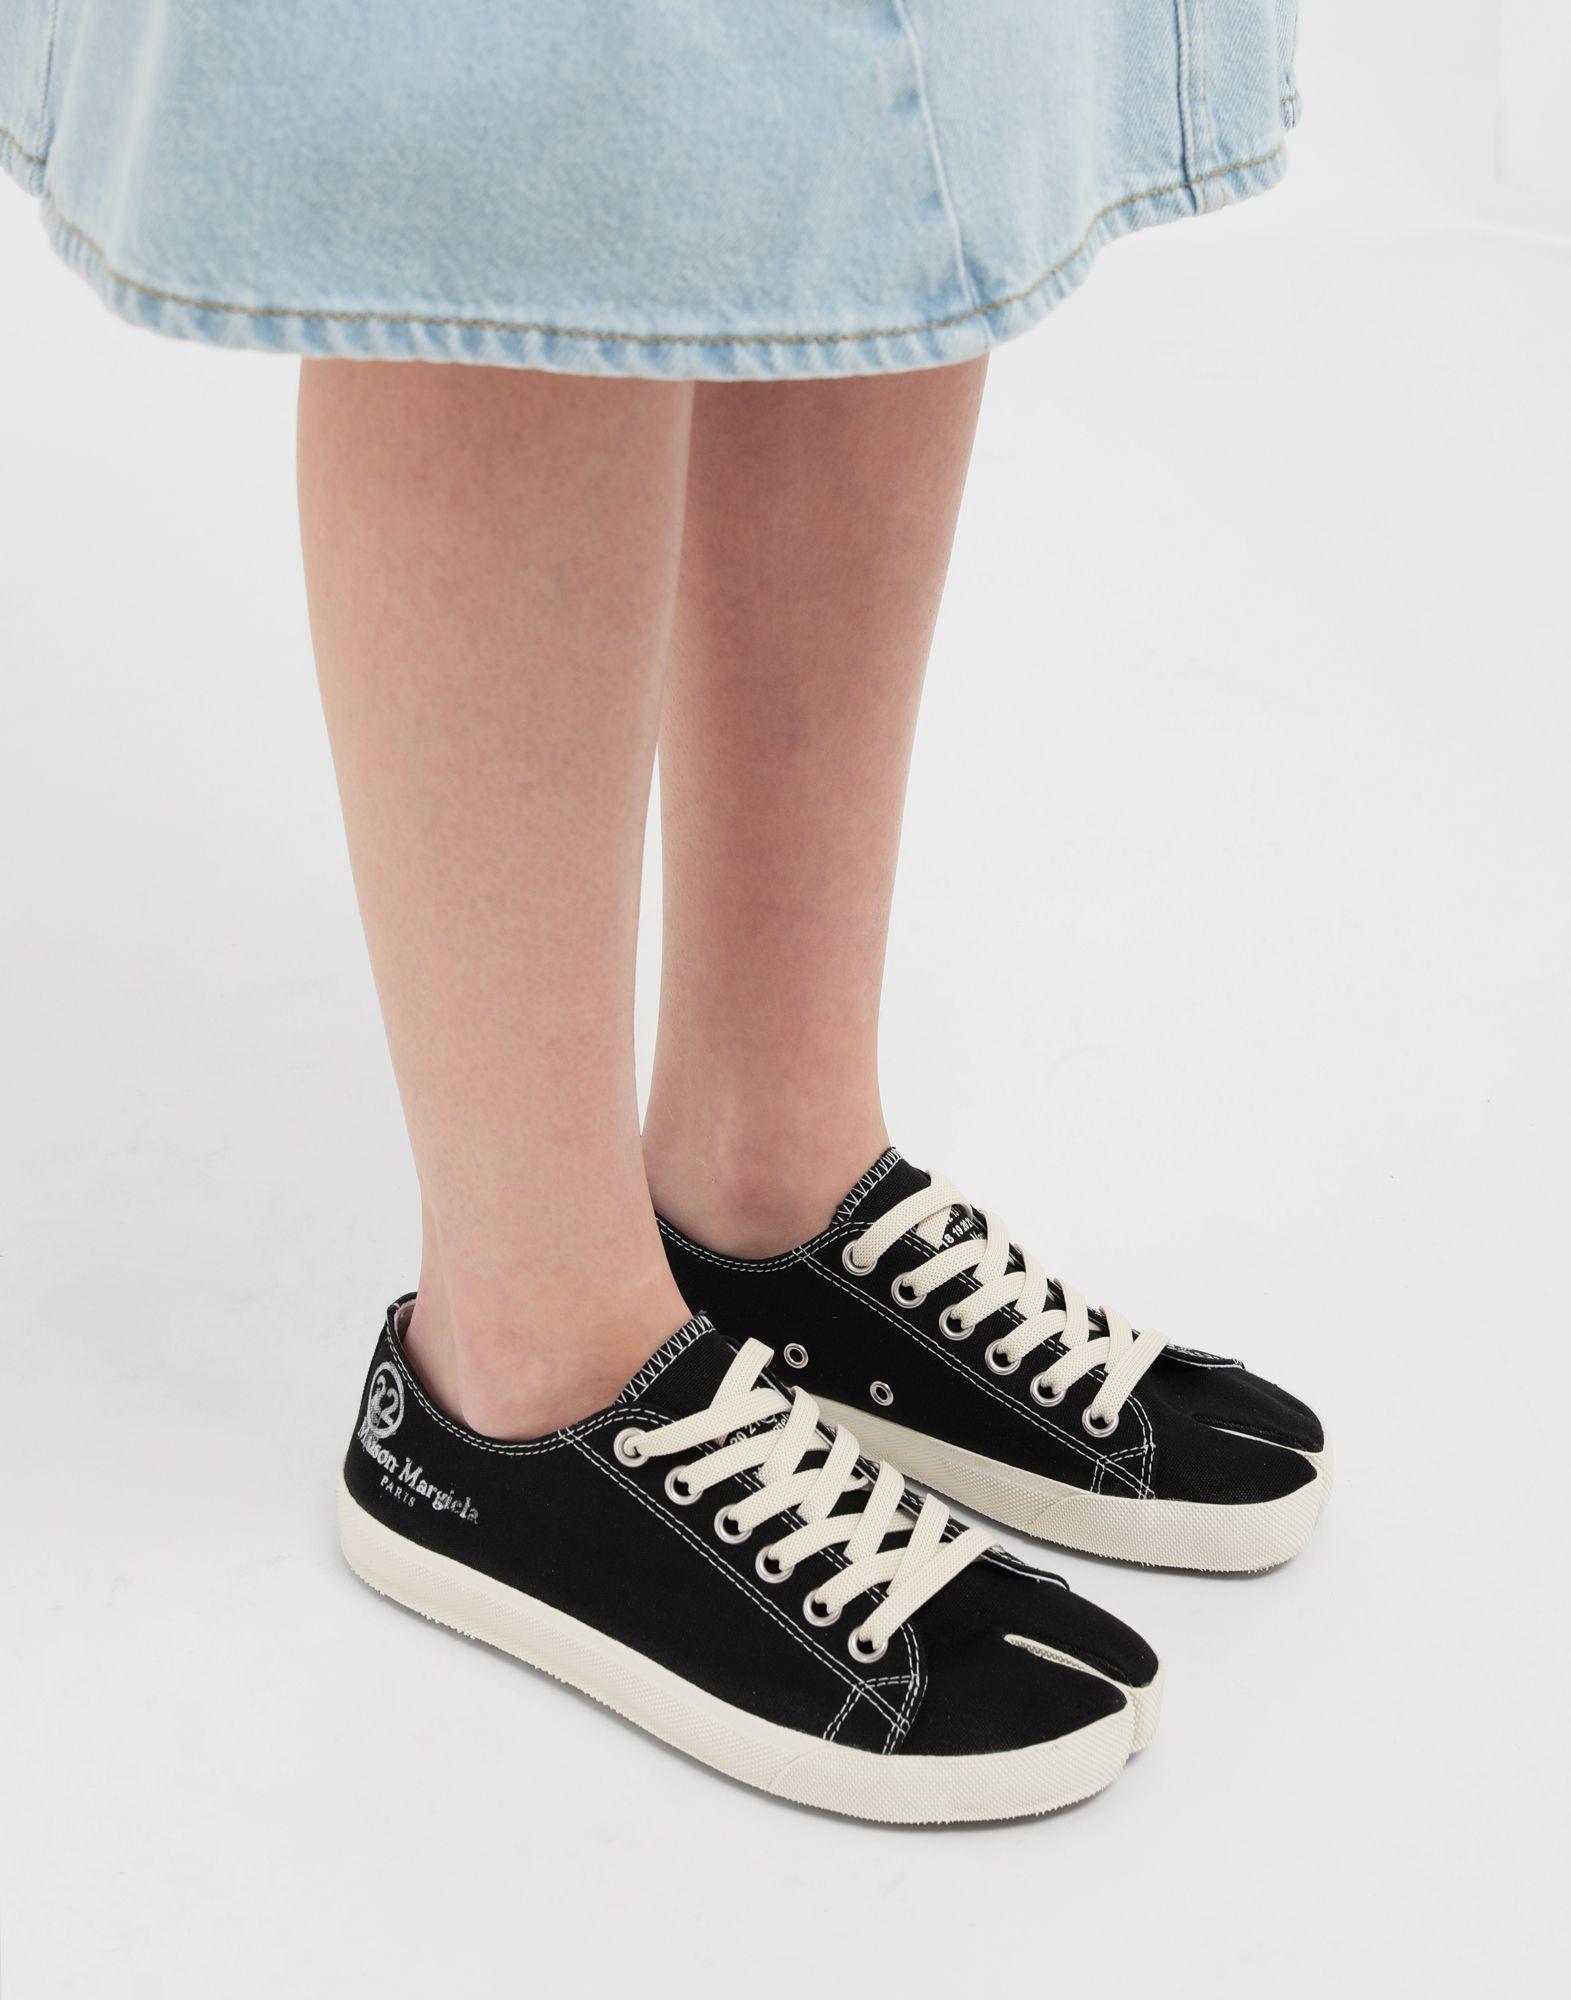 MAISON MARGIELA Tabi low top canvas sneakers Sneakers Tabi Woman b